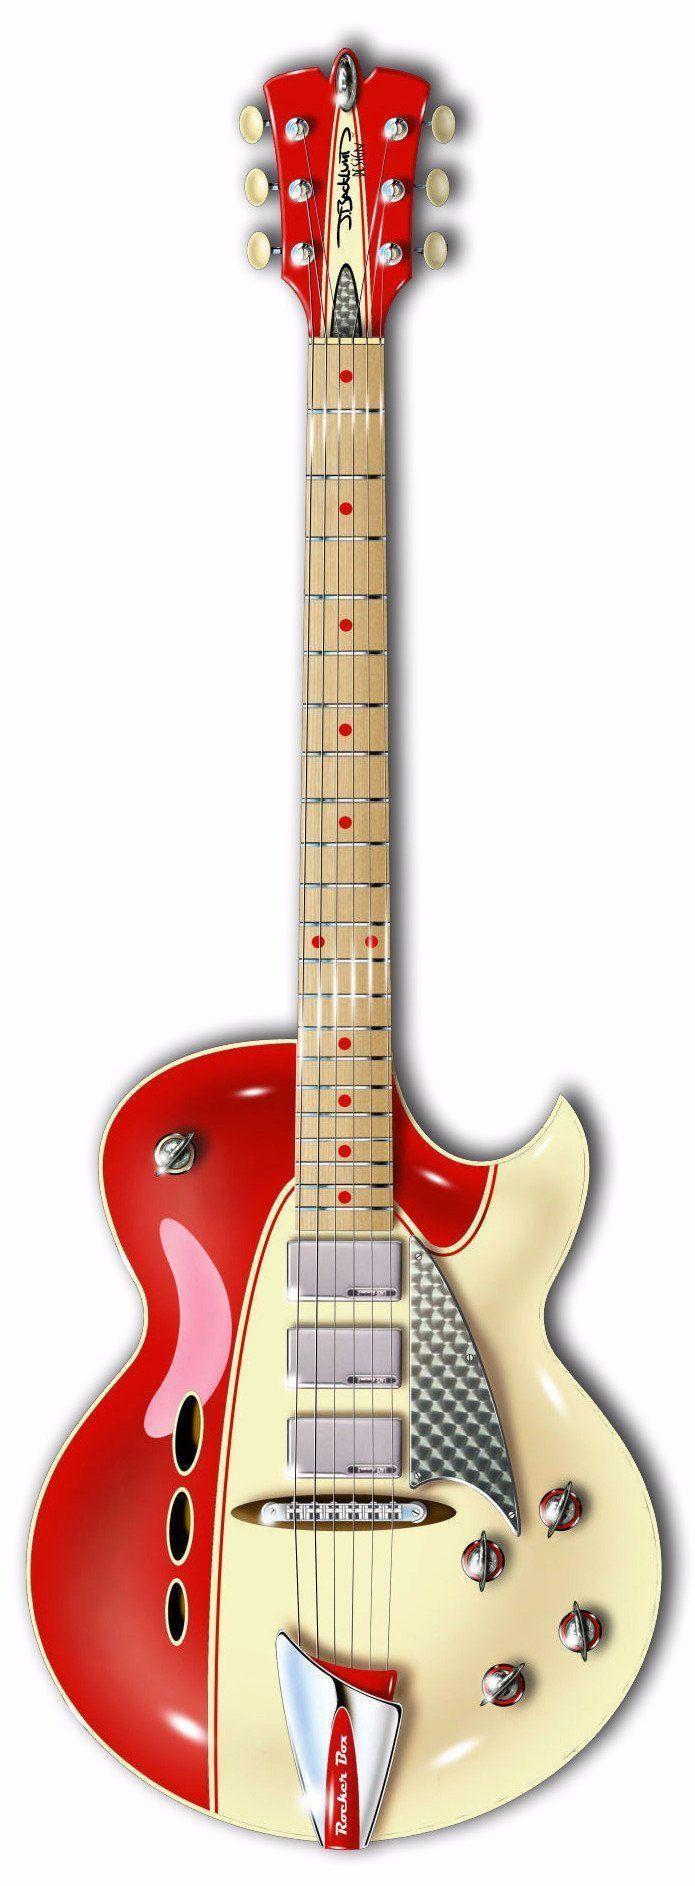 Rocker Box #vintageguitars #beautifulguitars